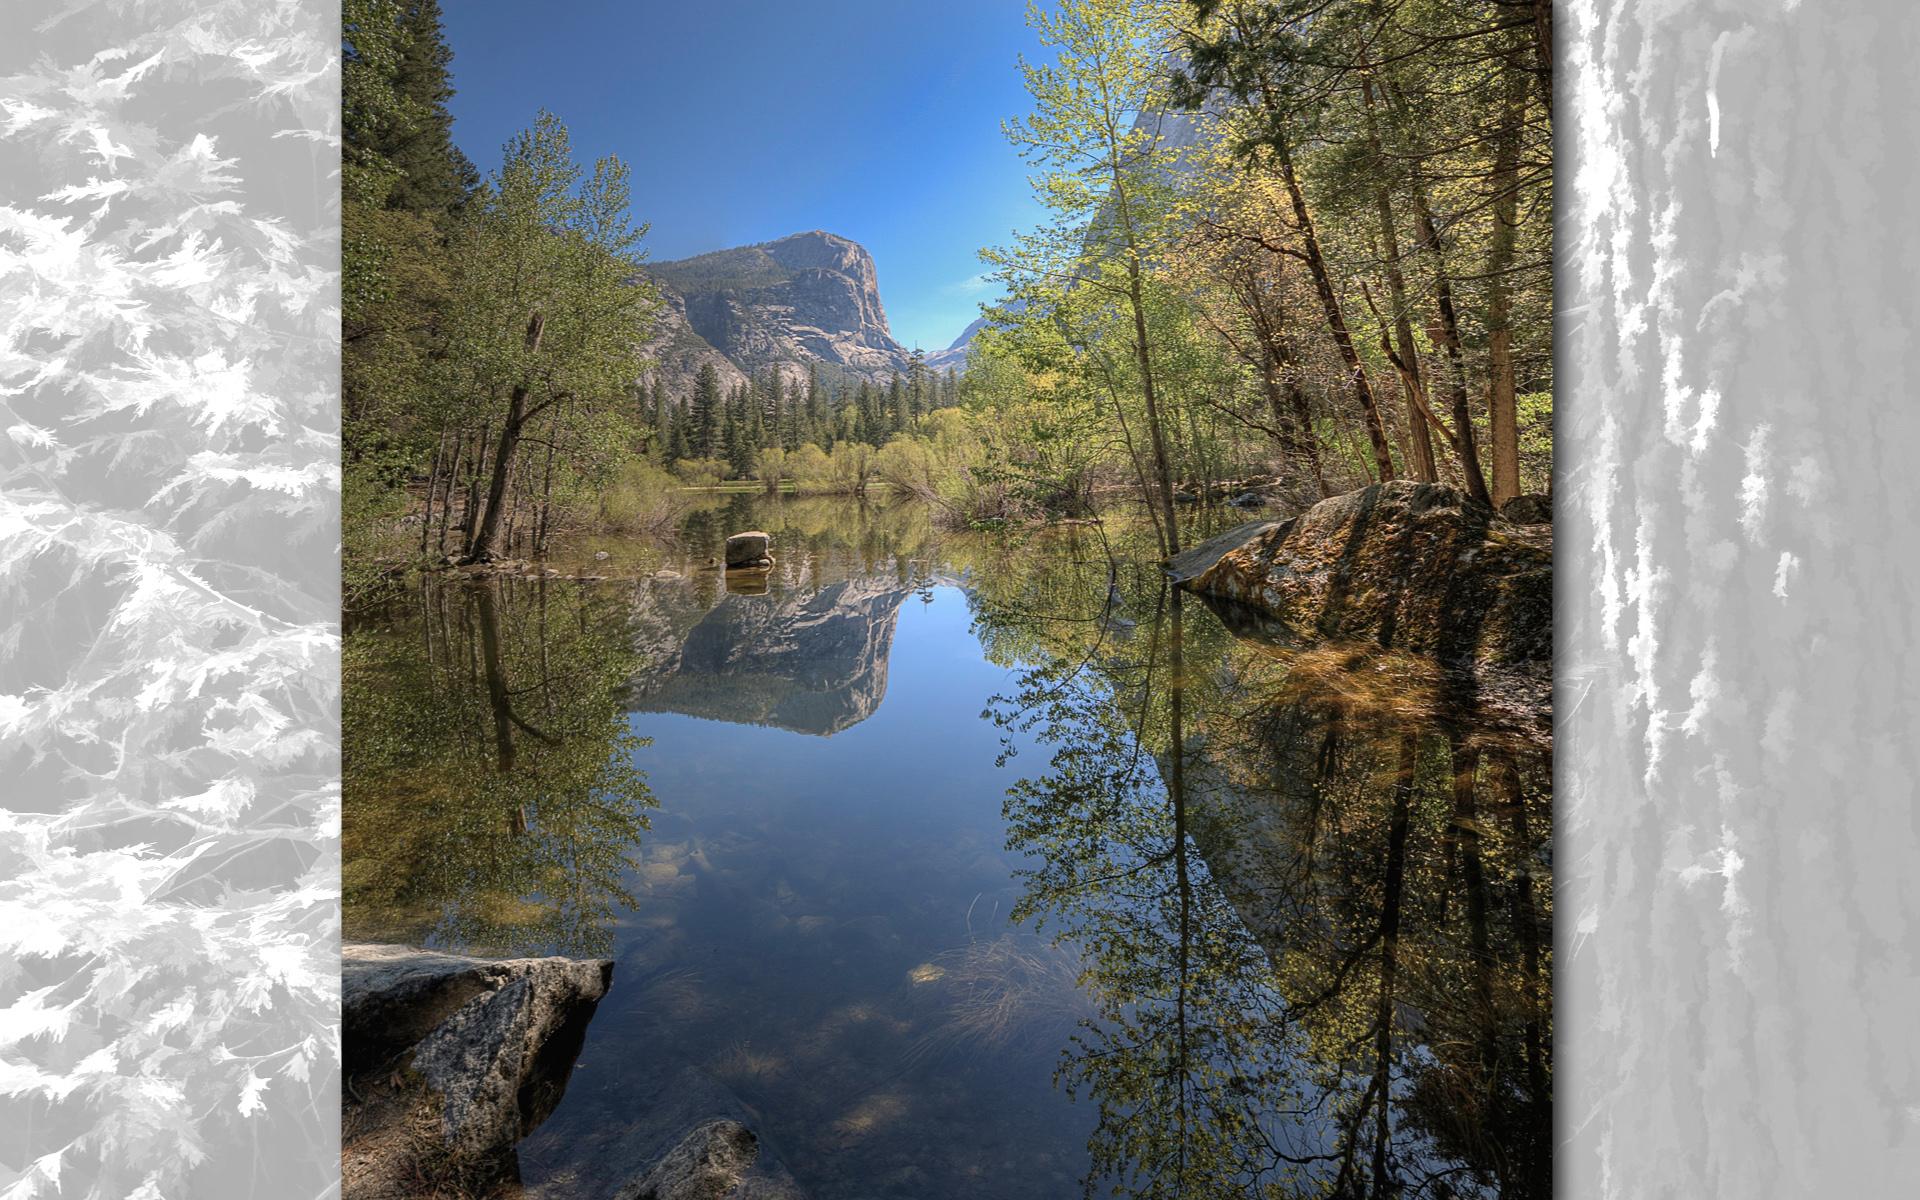 02 Yosemite 09 Final.003.jpg